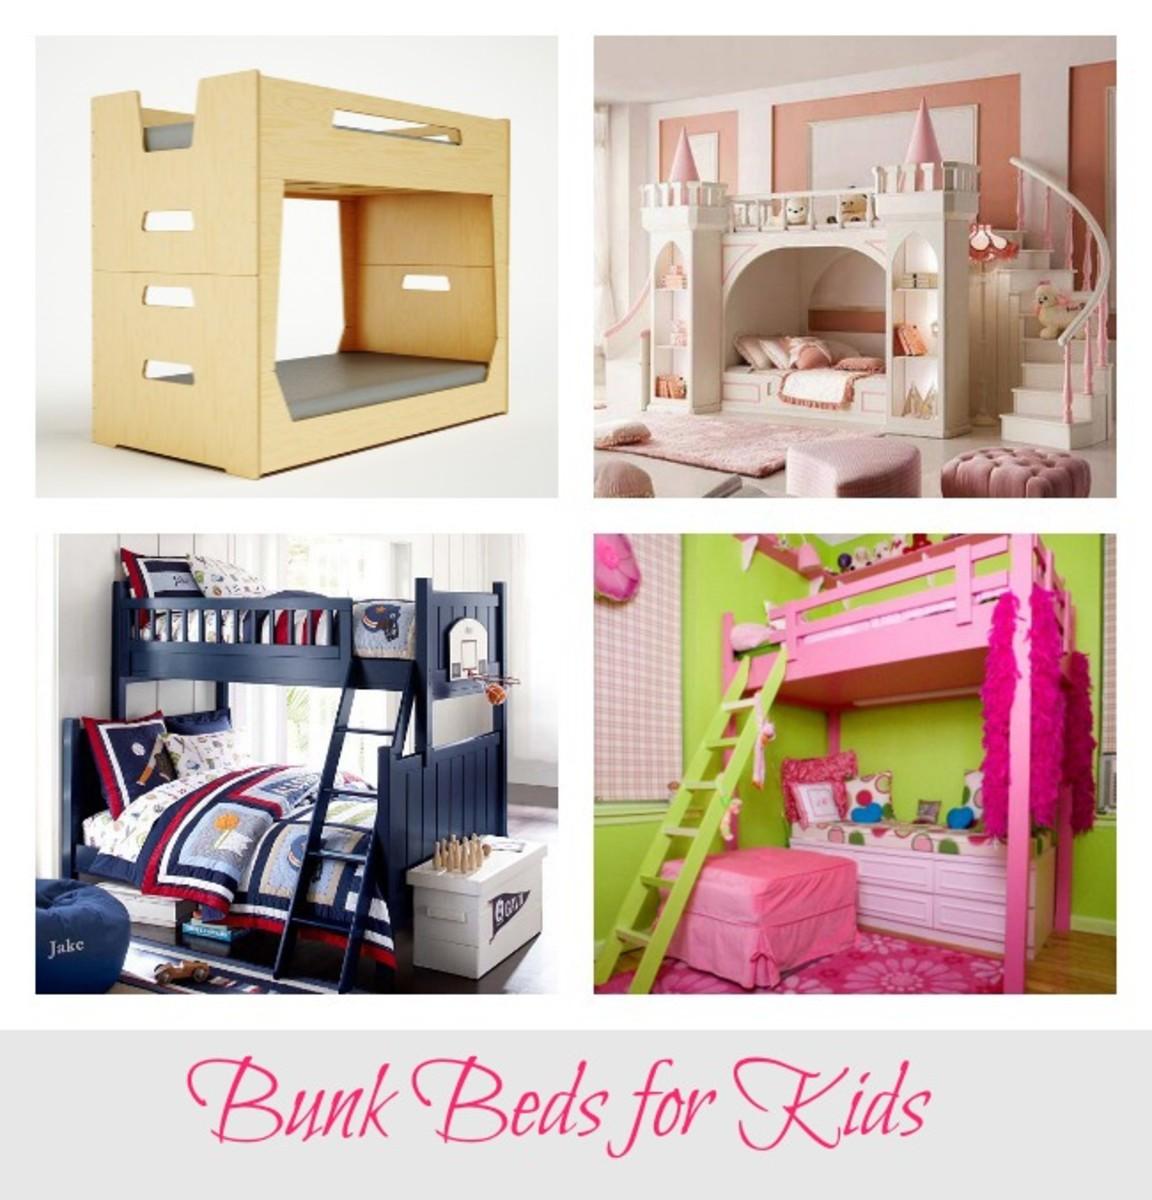 Favorite Bunk Beds for Kids - MomTrendsMomTrends